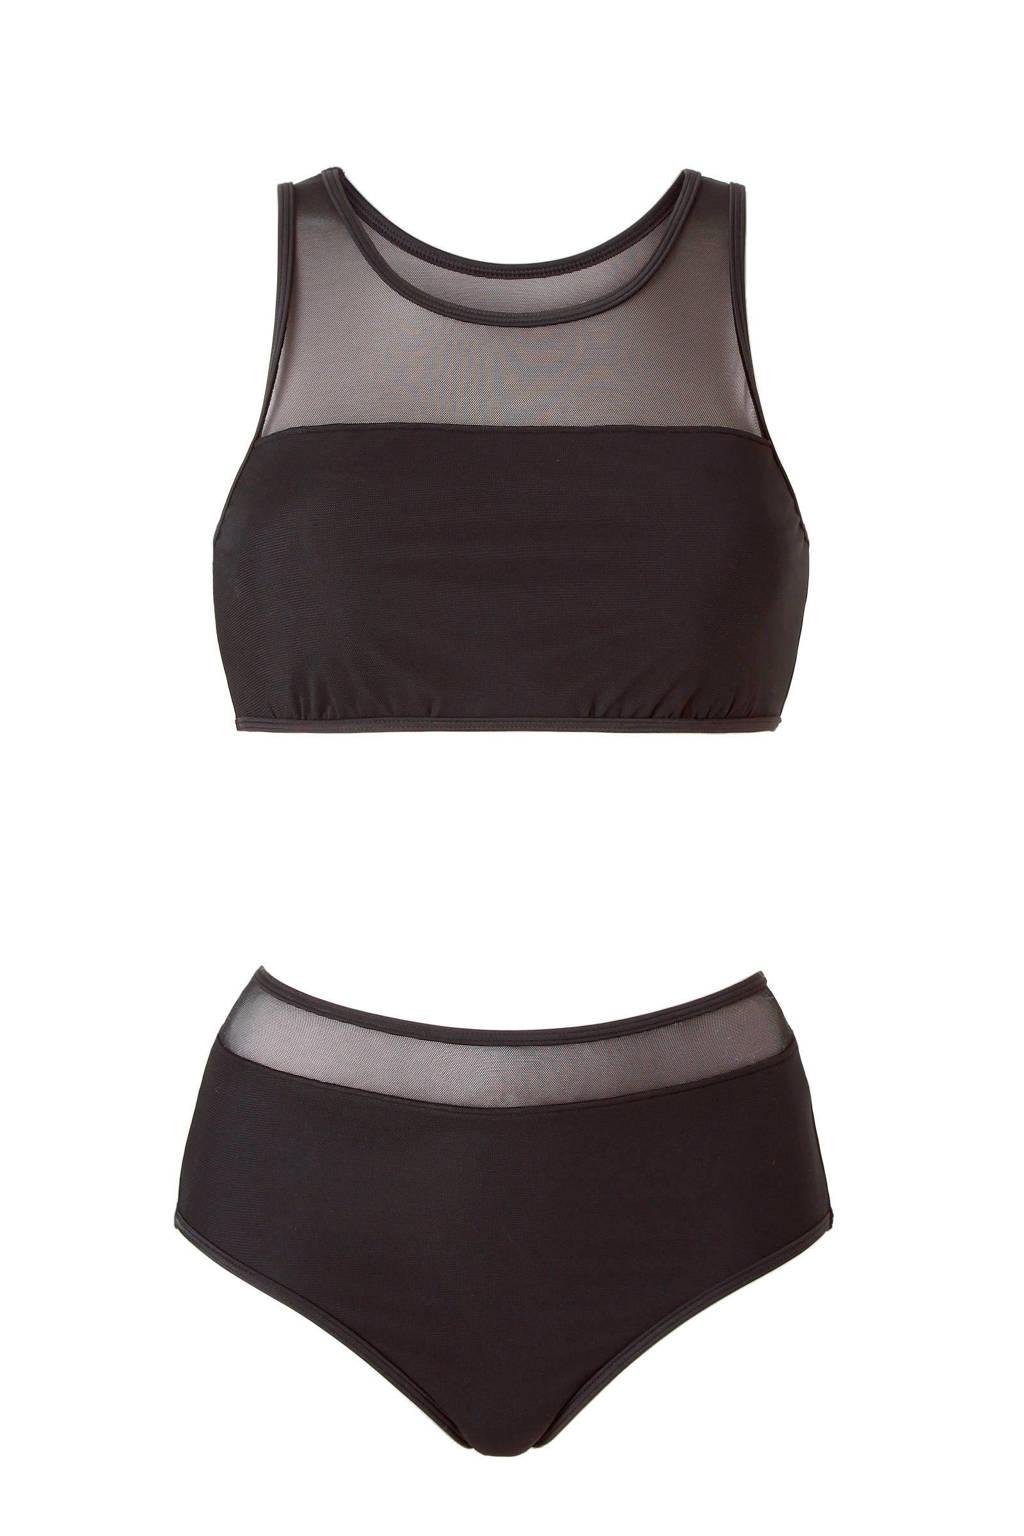 whkmp's beachwave crop bikini met mesh zwart, Zwart